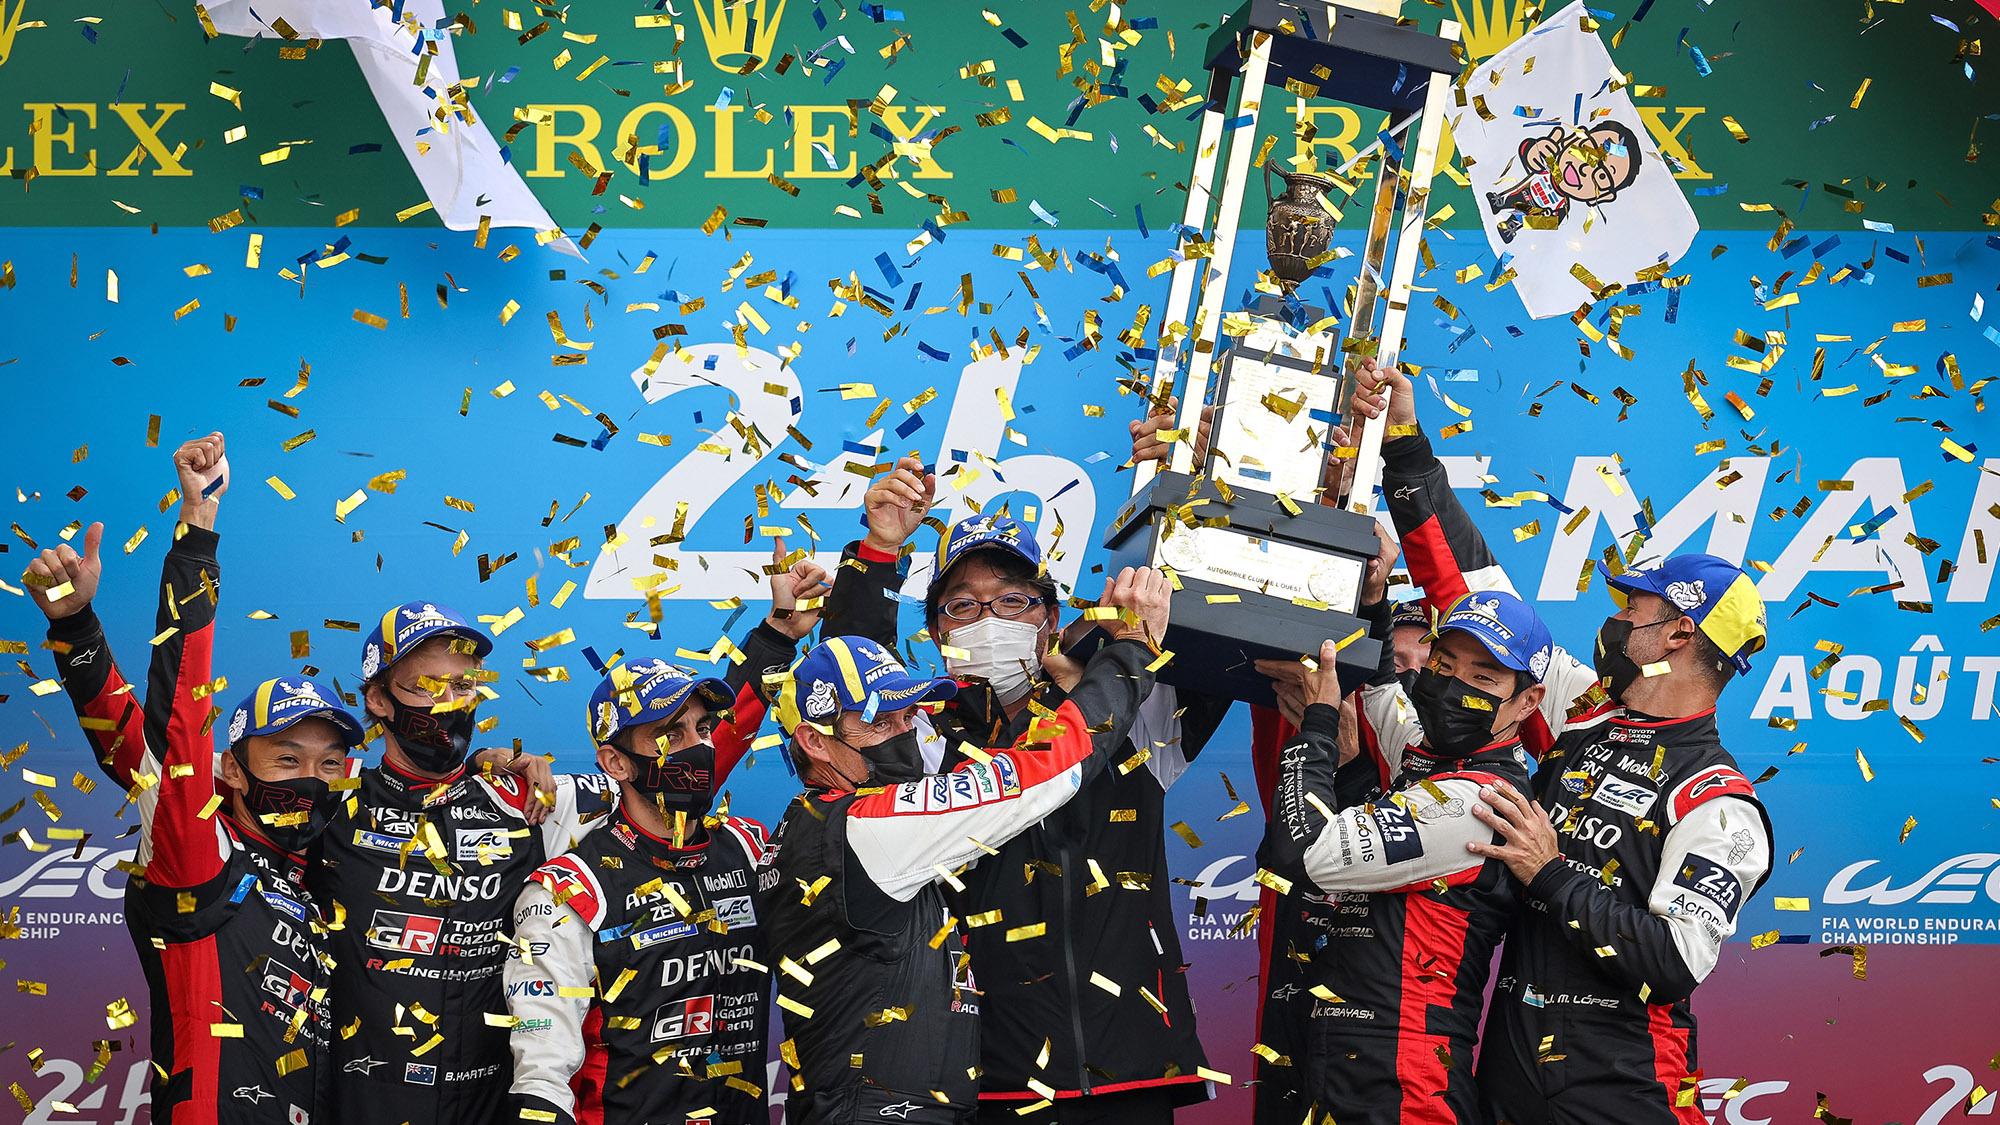 Toyota podium celebration at 2021 Le Mans 24 Hours